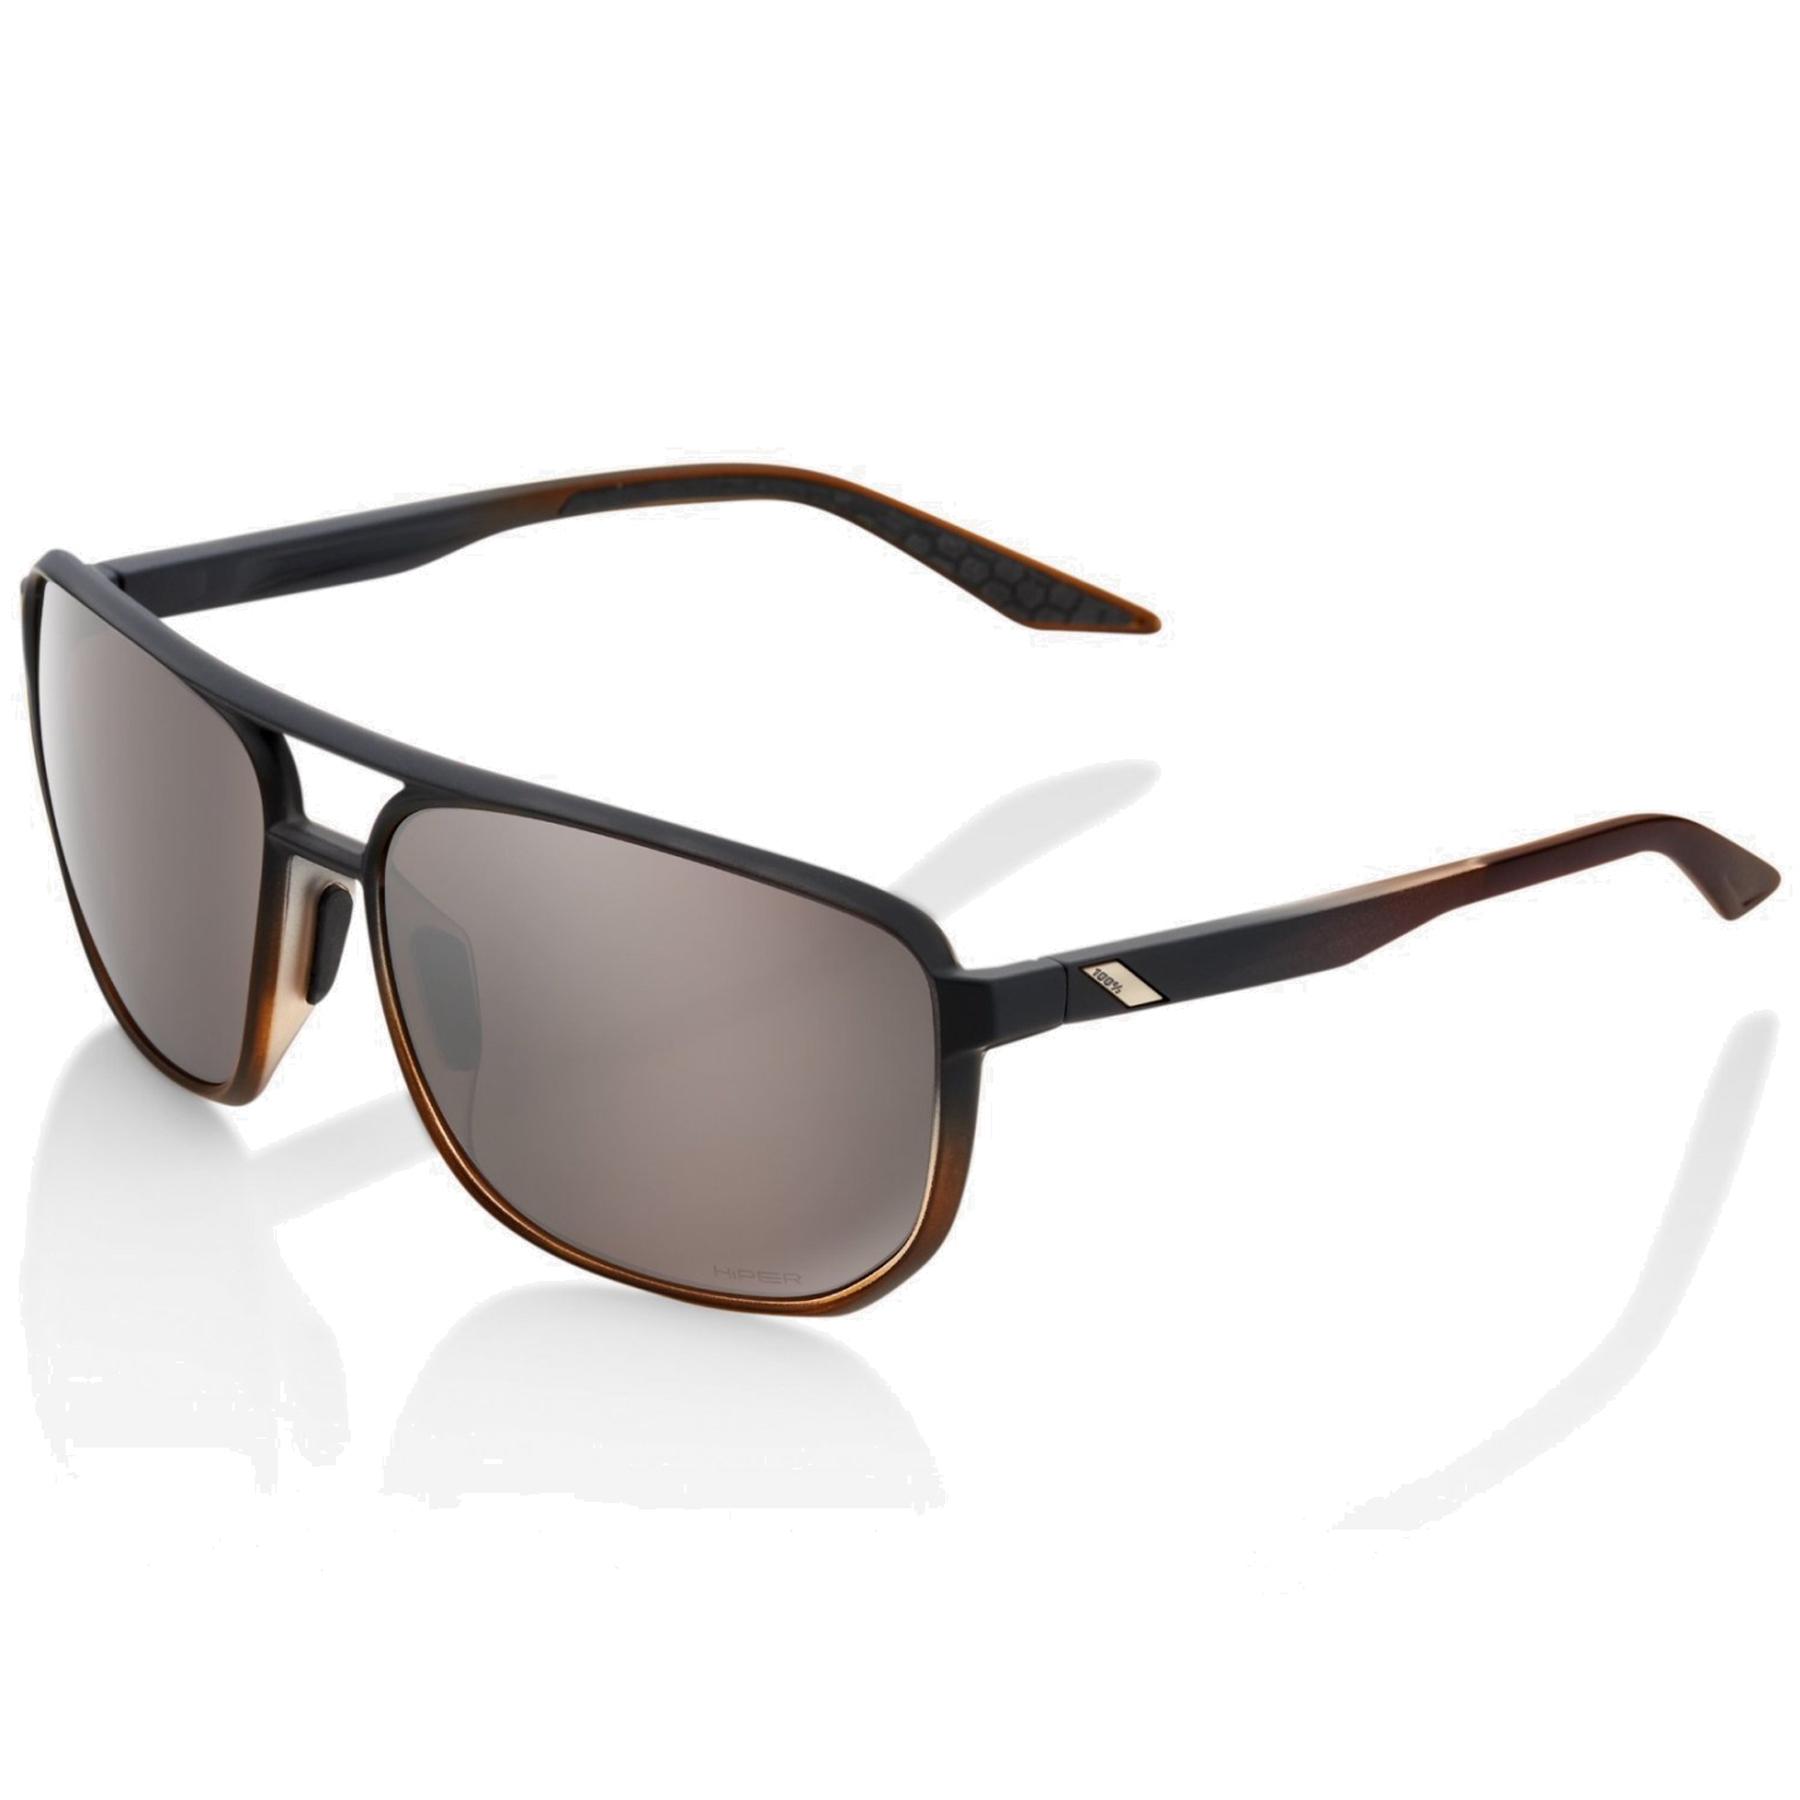 100% Konnor Aviator square - HiPER Mirror Lens Gafas - Matte Translucent Brown Fade/HiPER Silver Mirror